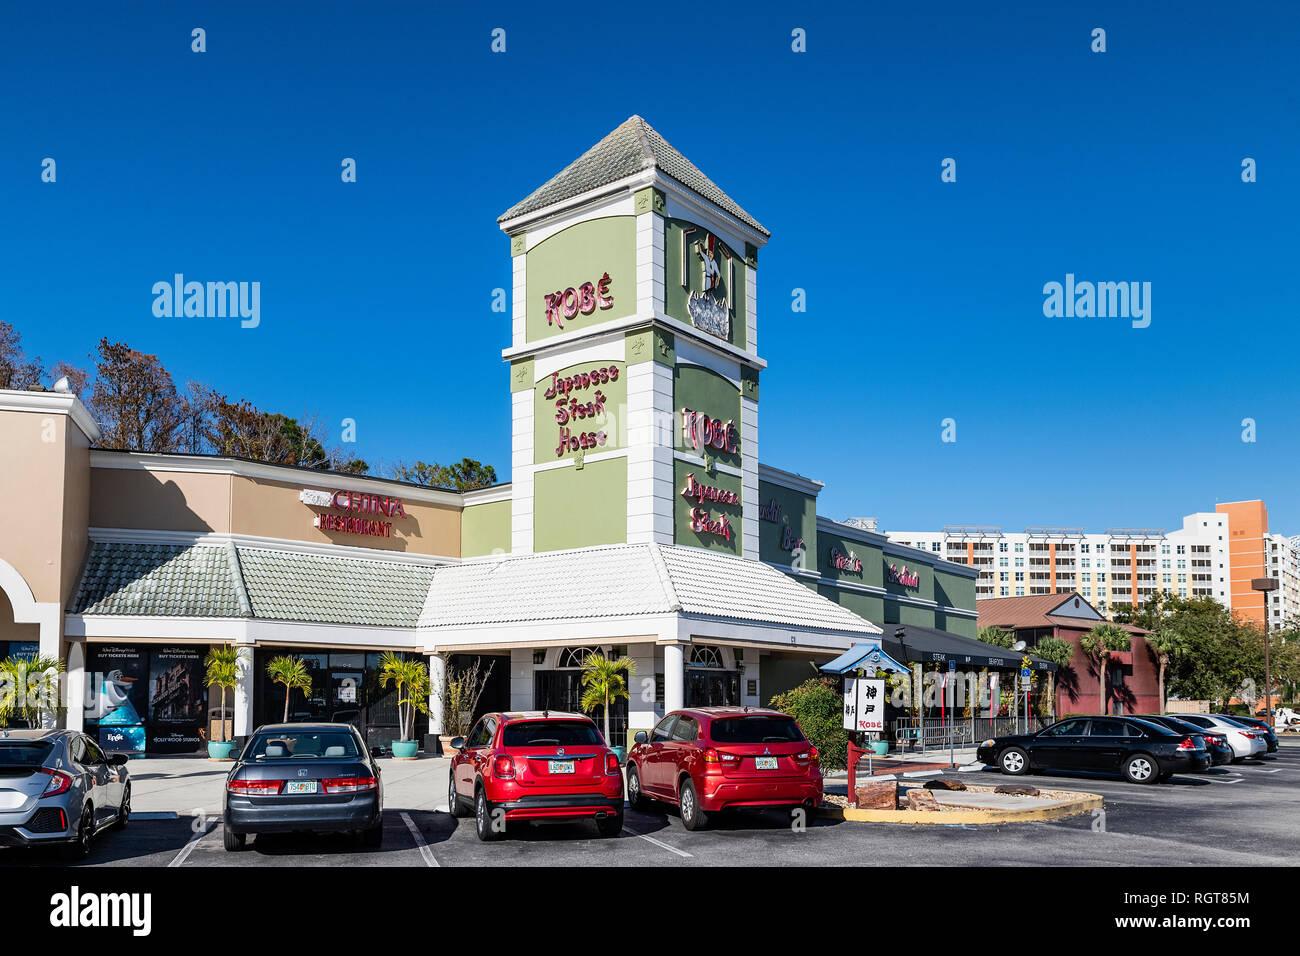 Kobe Japanese Steak House, Kissimmee, Florida, USA. - Stock Image